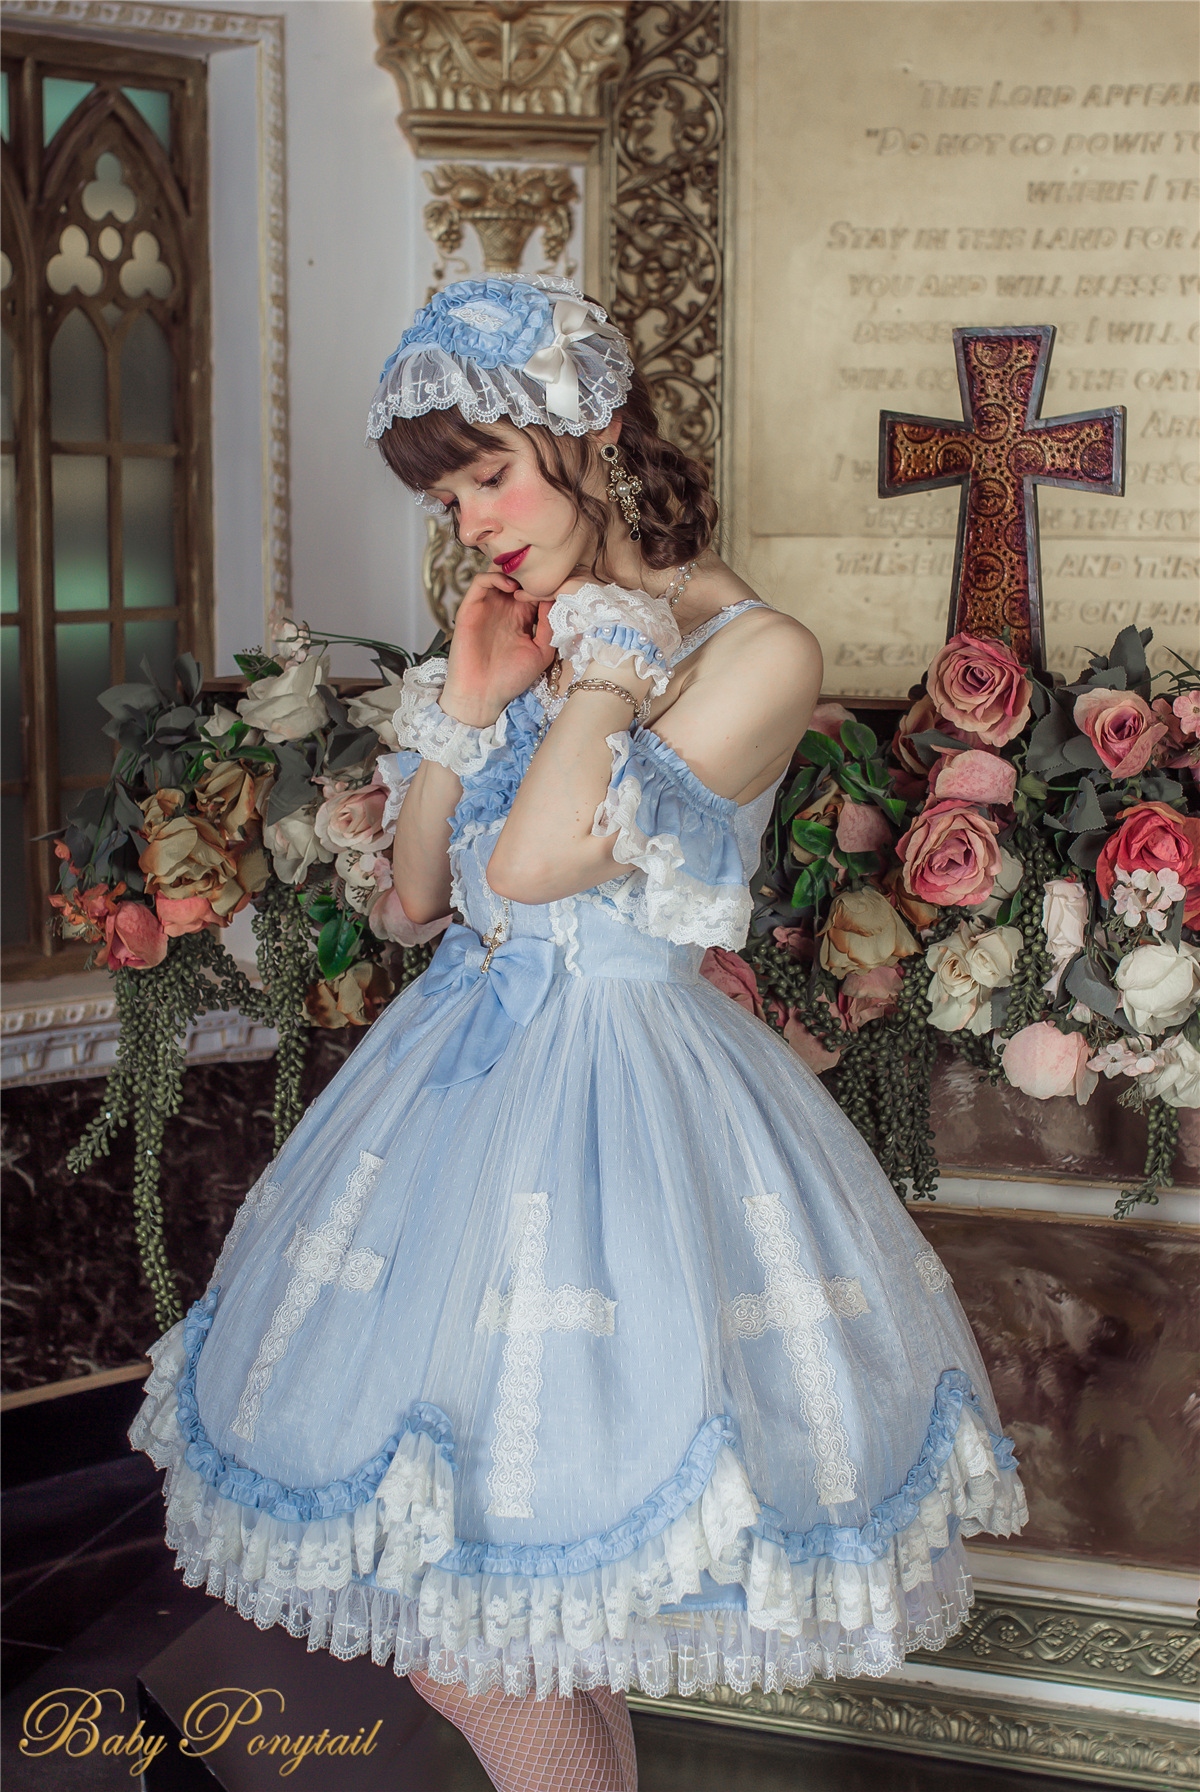 Babyponytail_Heavenly Teardrops_Model photo_JSK_Sax_Claudia_indoor_08.jpg